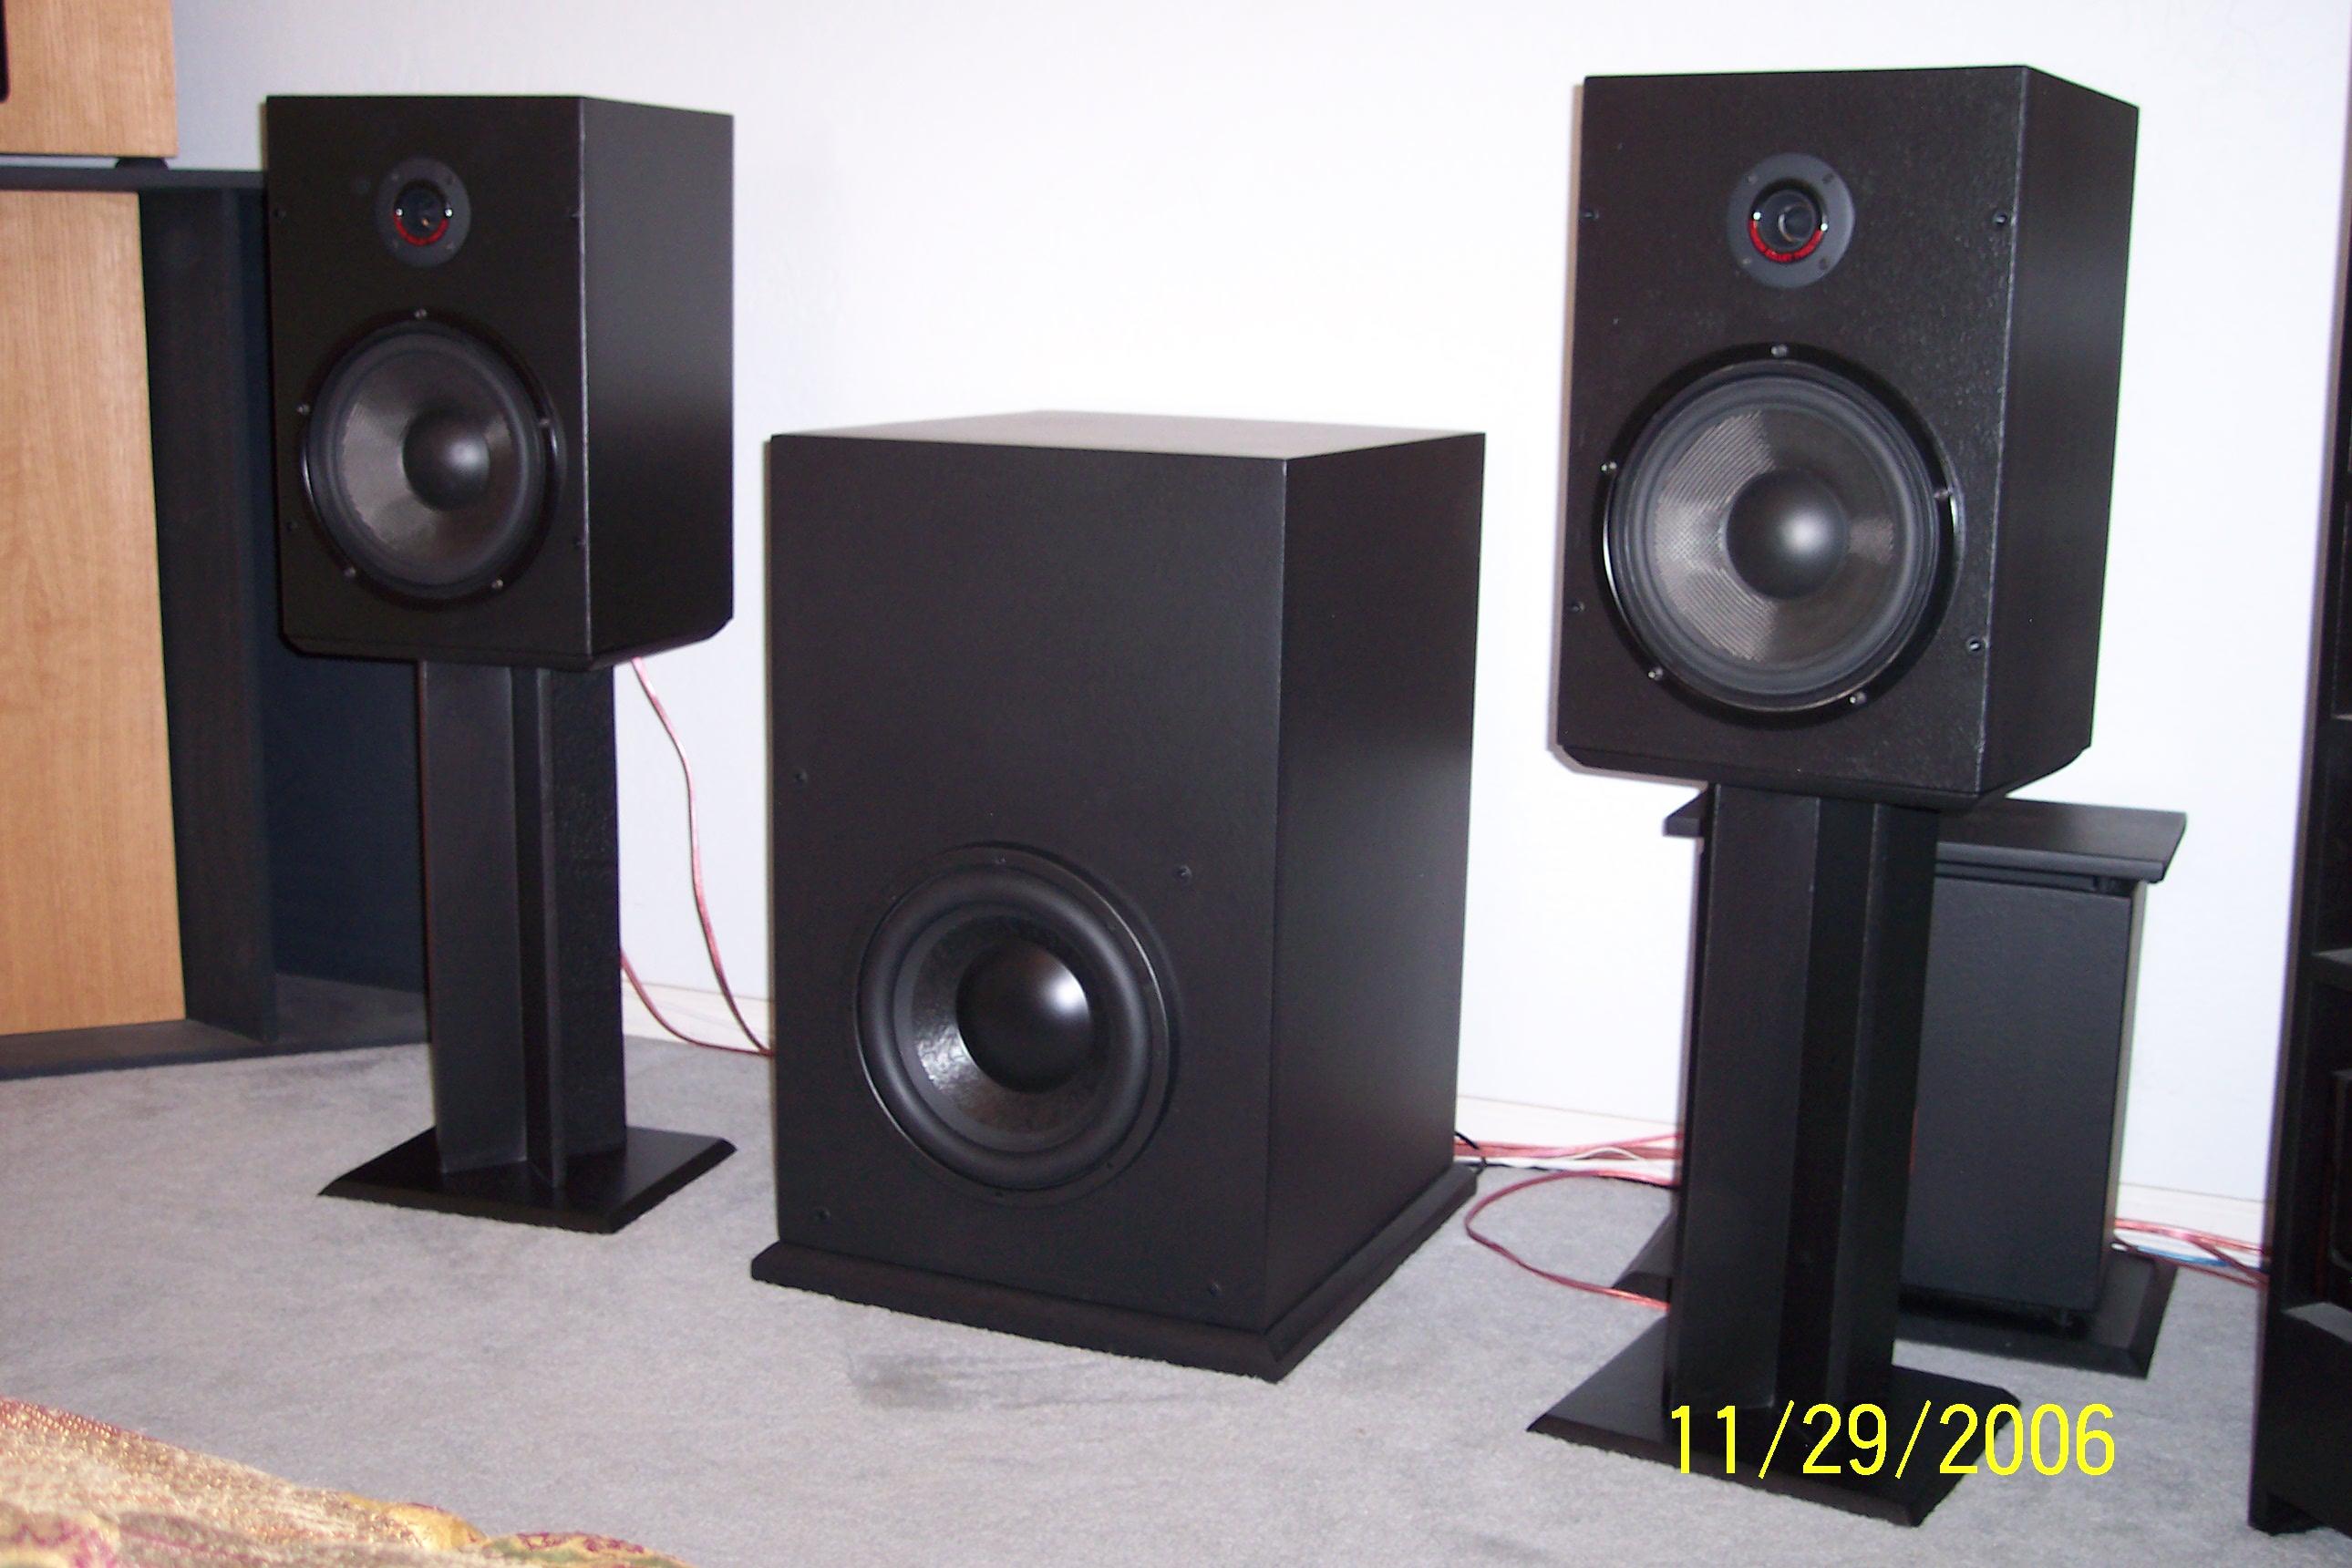 Modifying Cerwin Vega RE series speakers to Klipsch